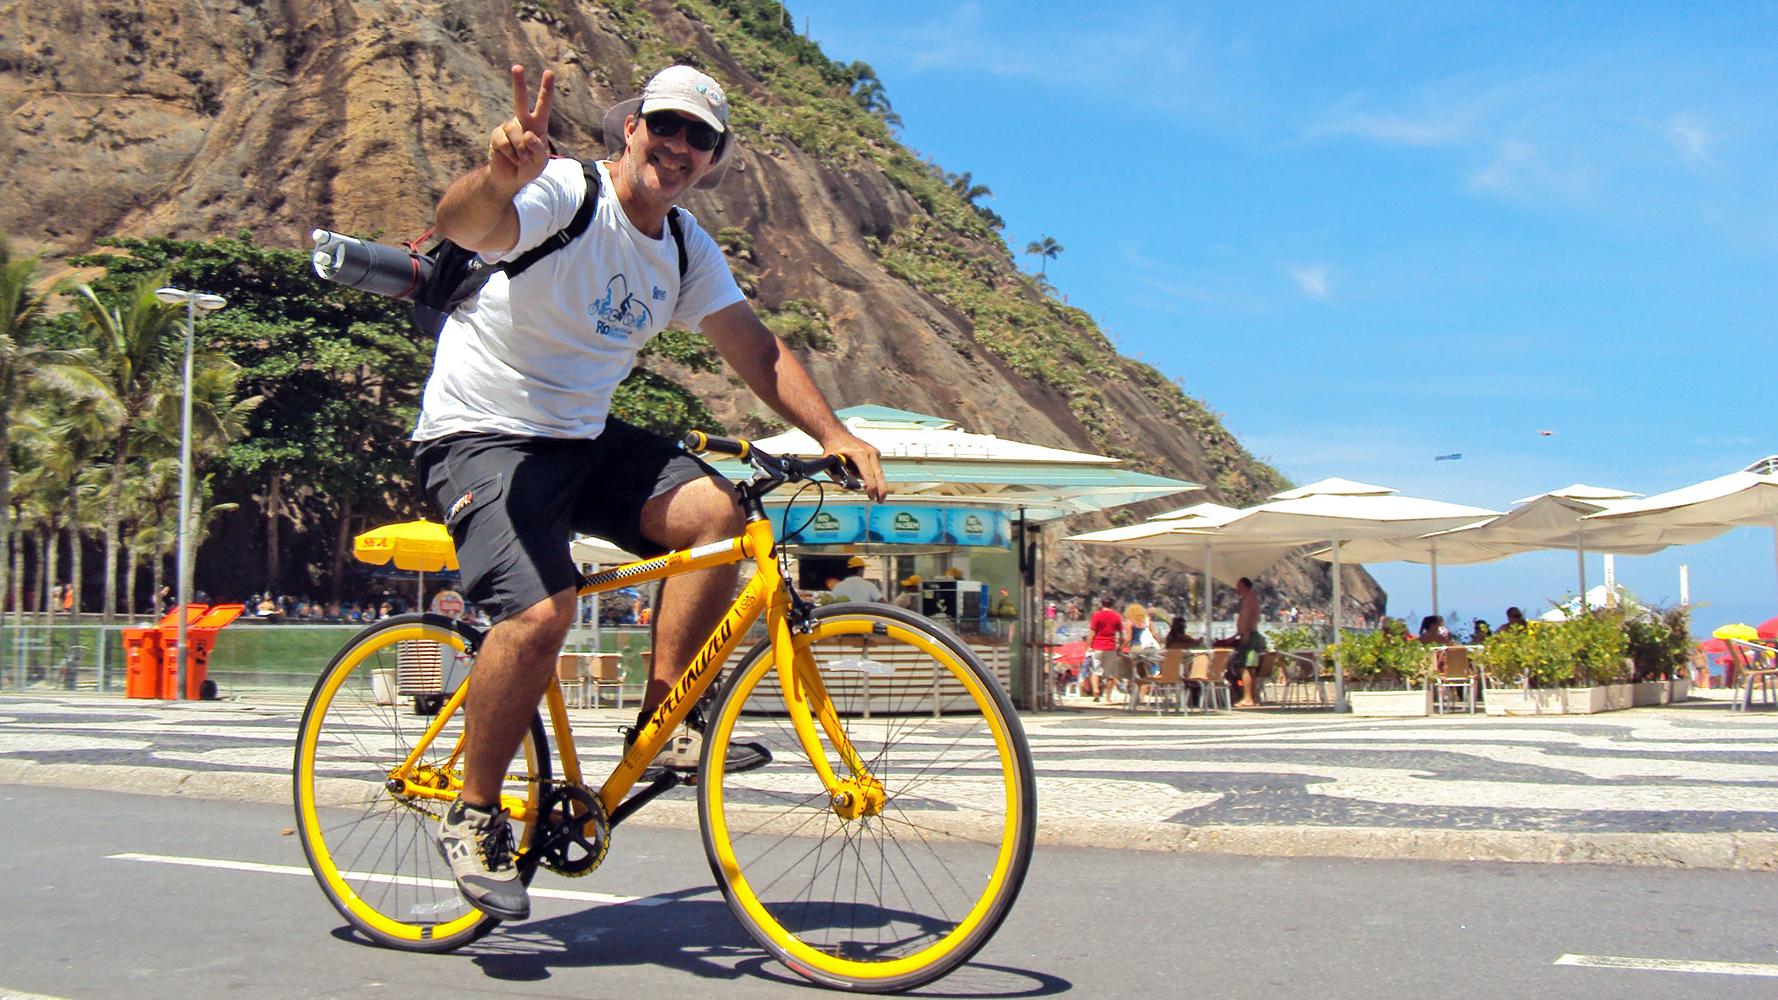 Ze Lobo Rio De Janeiro